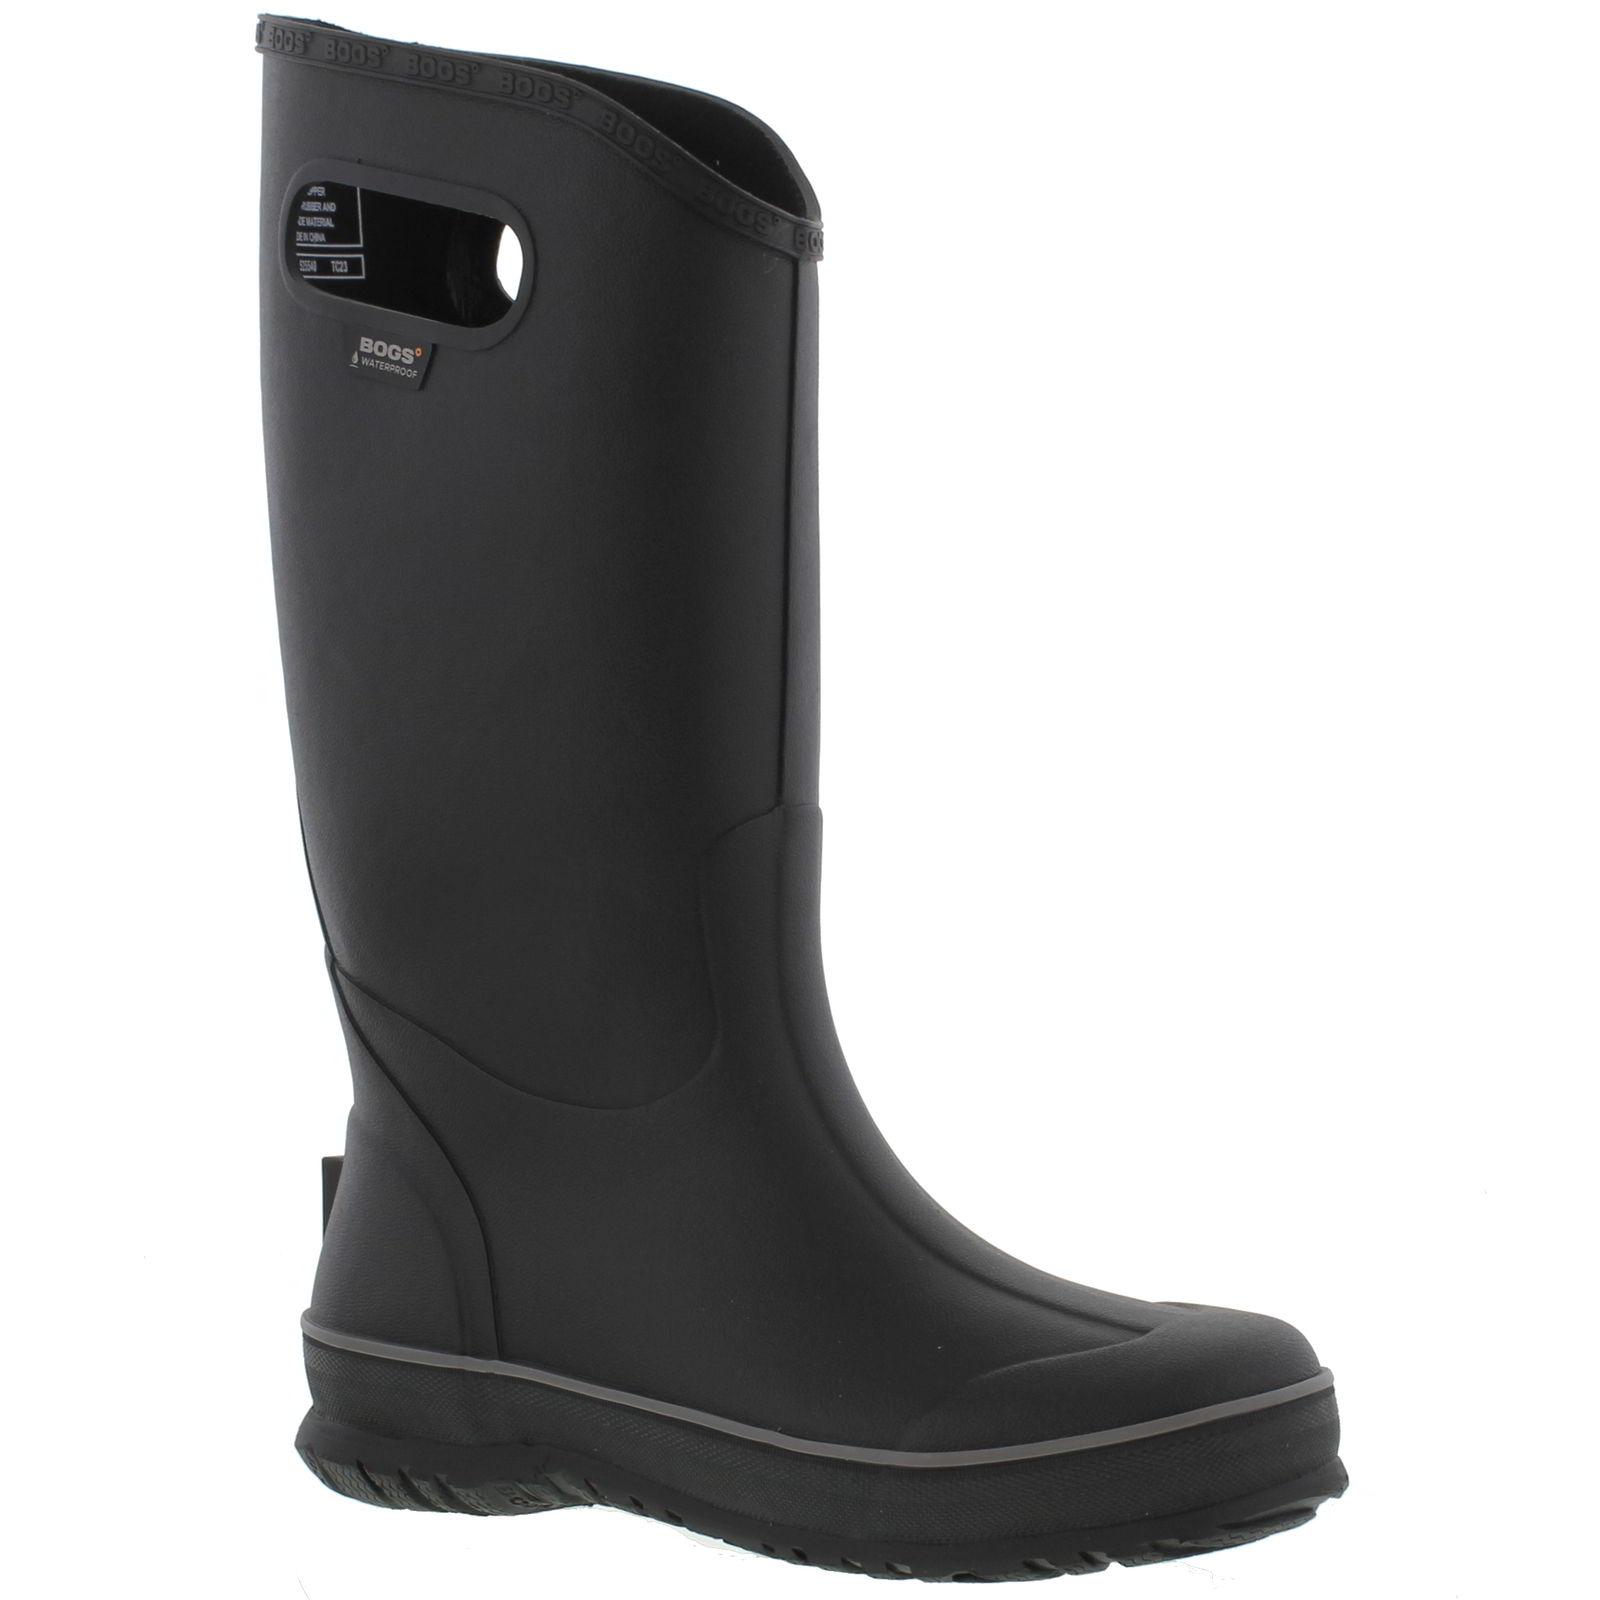 a89136383 Detalles acerca de Bogs Bota De Lluvia para Hombres Negro Wellington Botas  de lluvia Alto Caminar Botas De Agua Size Uk 7-11- mostrar título original